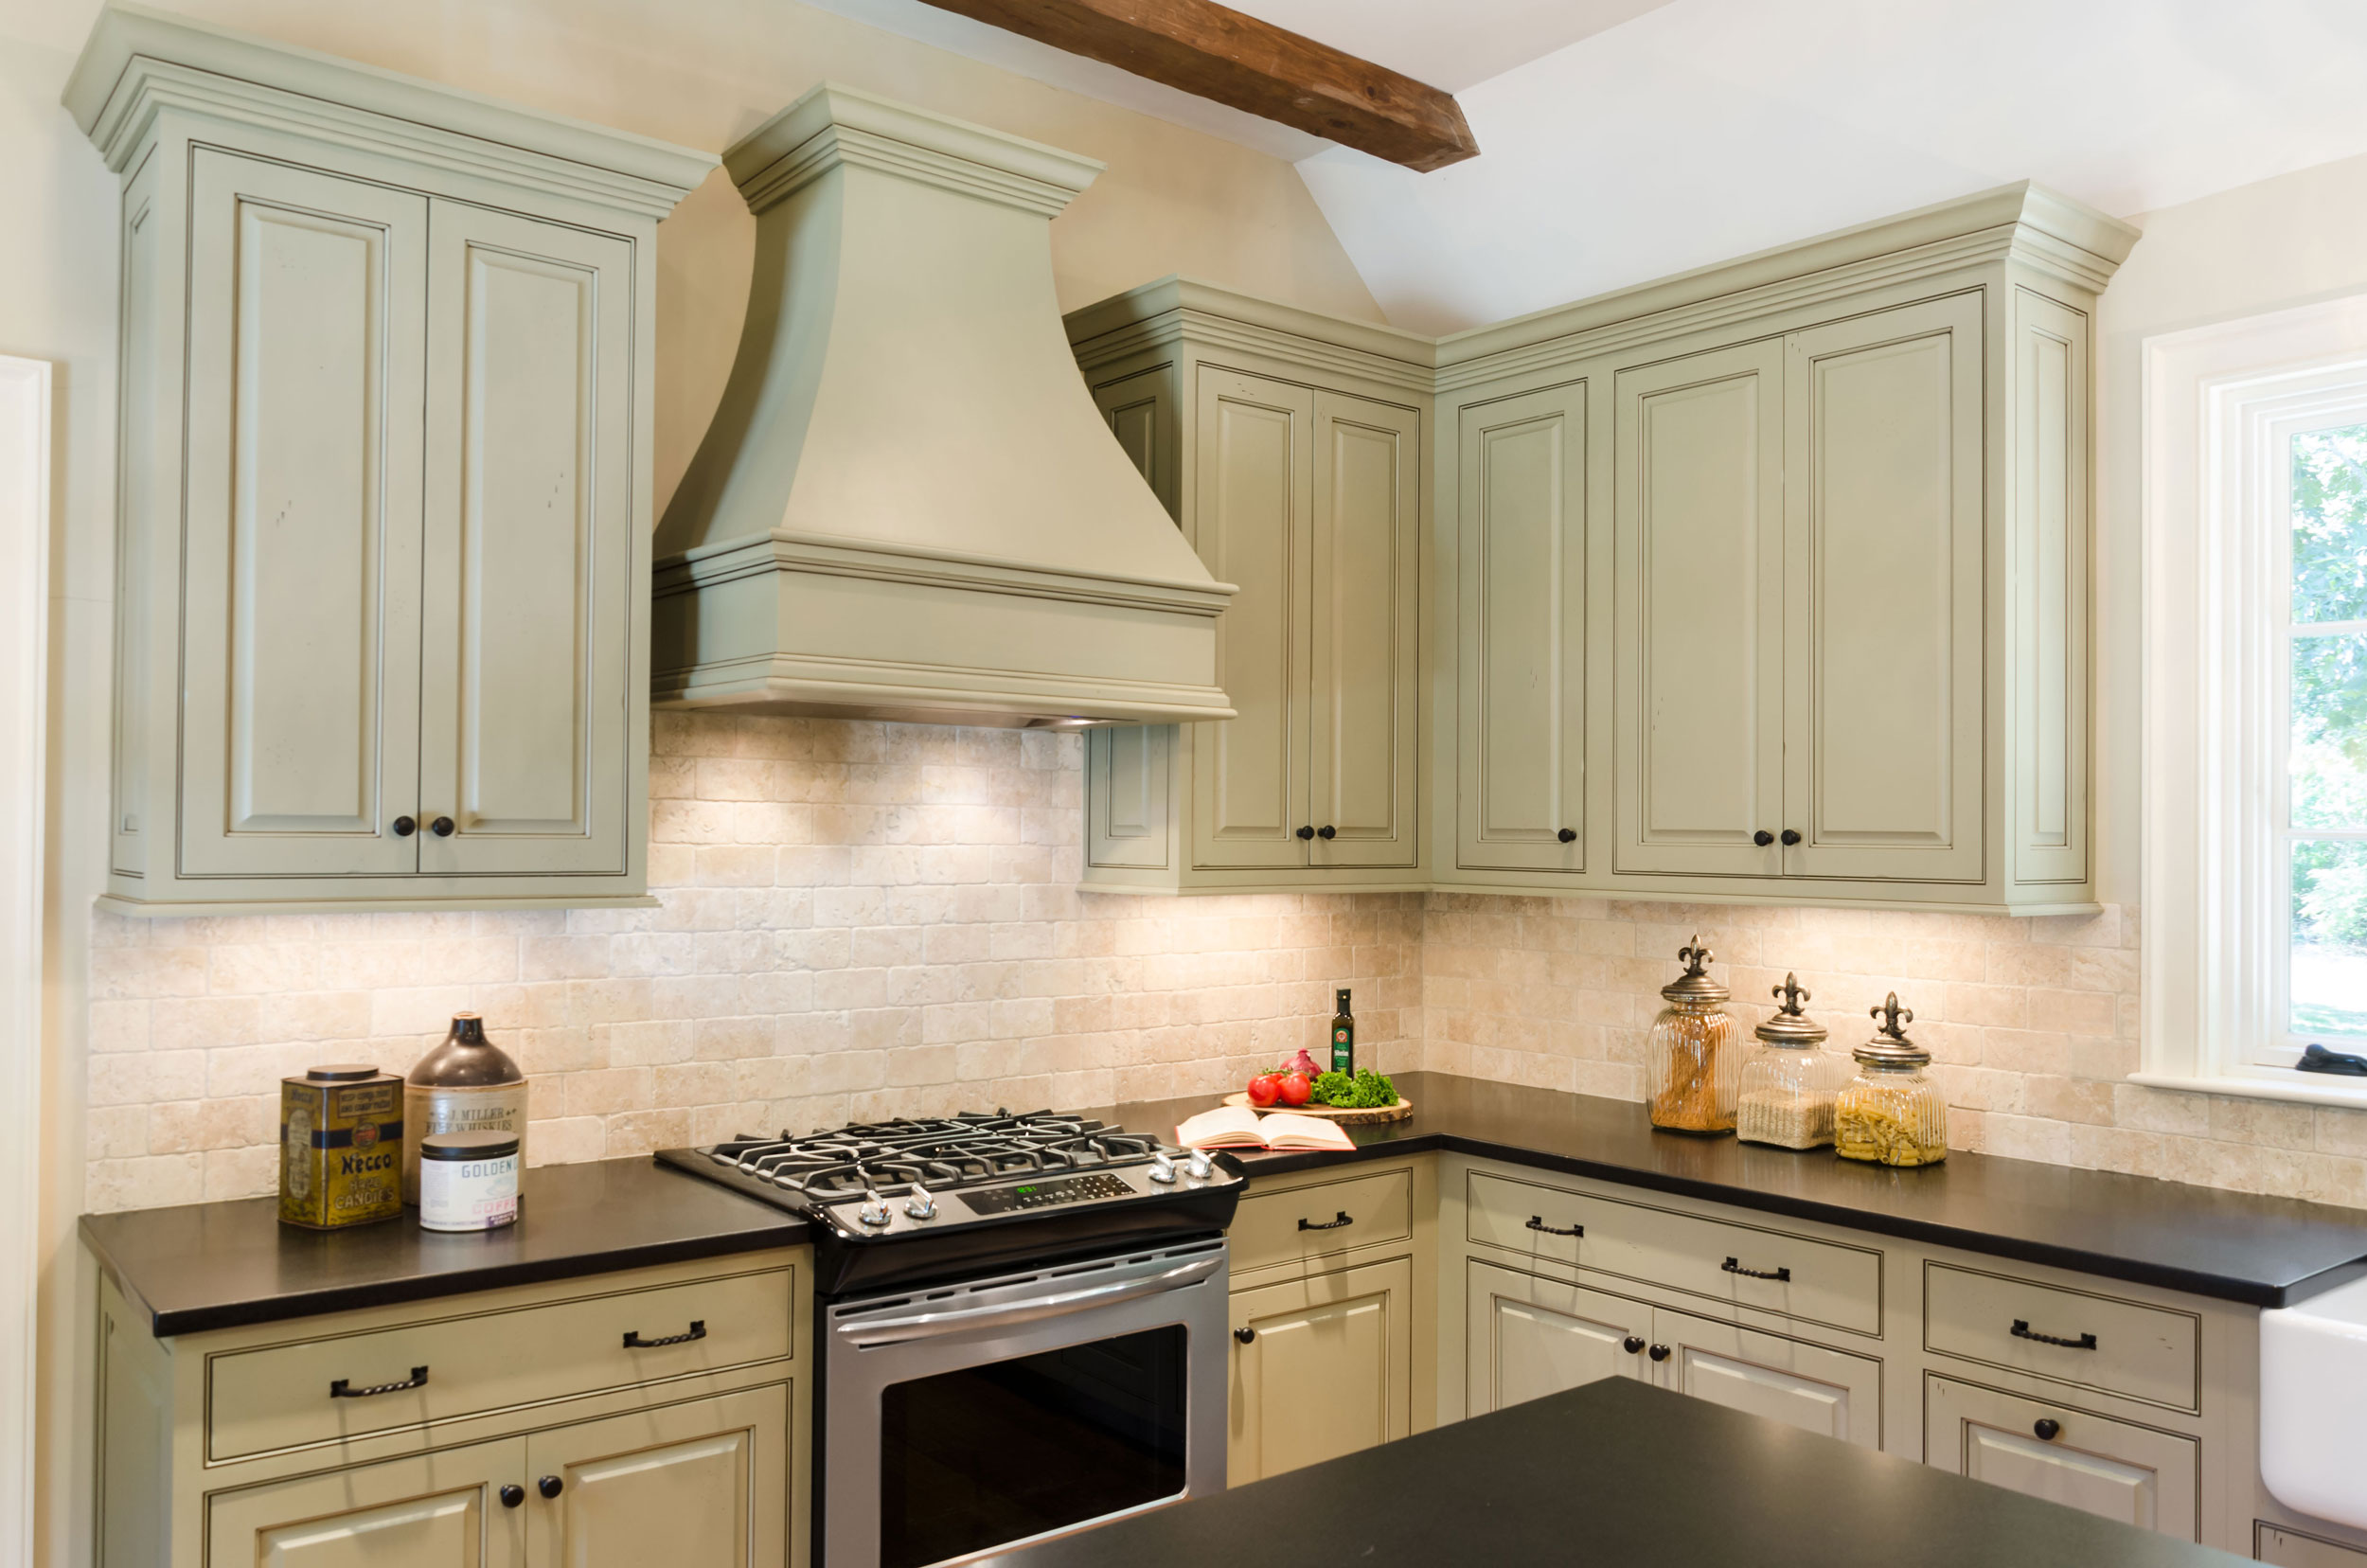 Duxbury, Ma kitchen revitalization by Susan Curtis Interiors